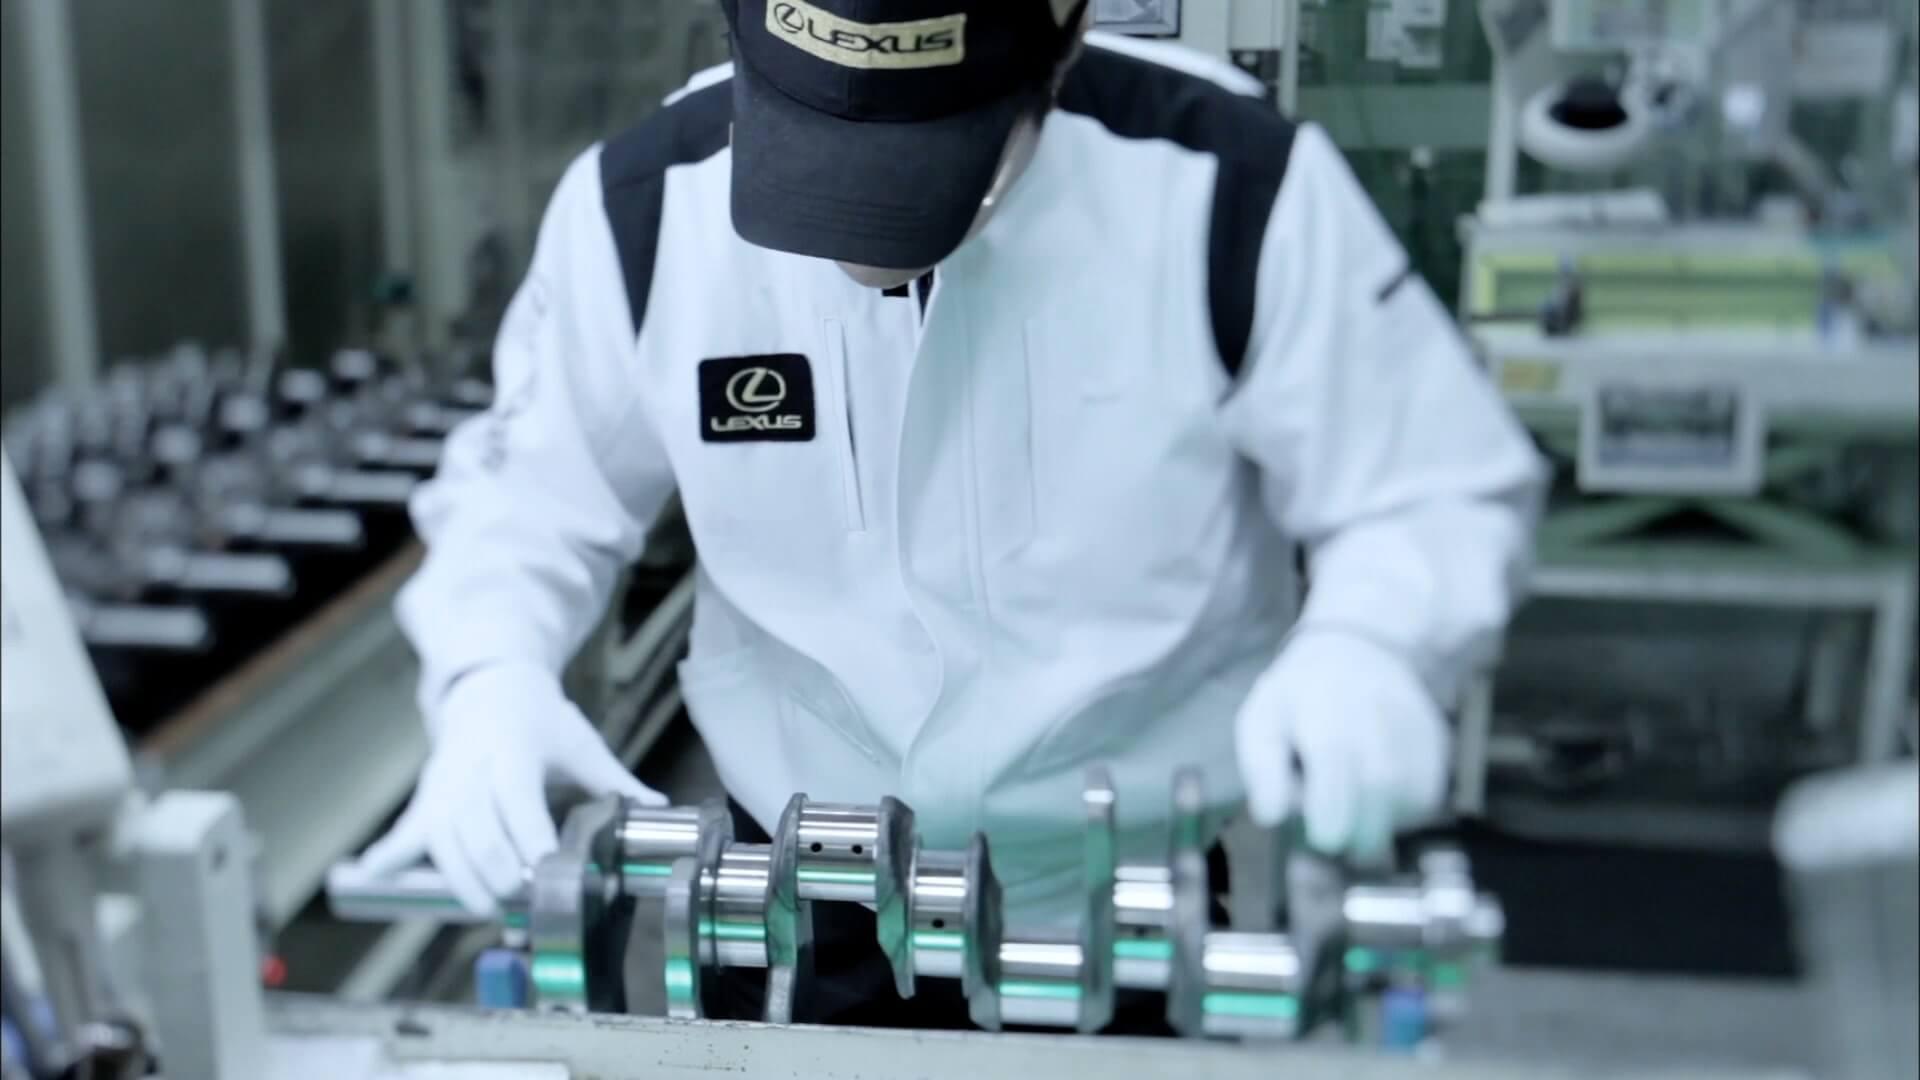 En Lexus Takumi mester kledd i hvitt med Lexus emblem på brystet